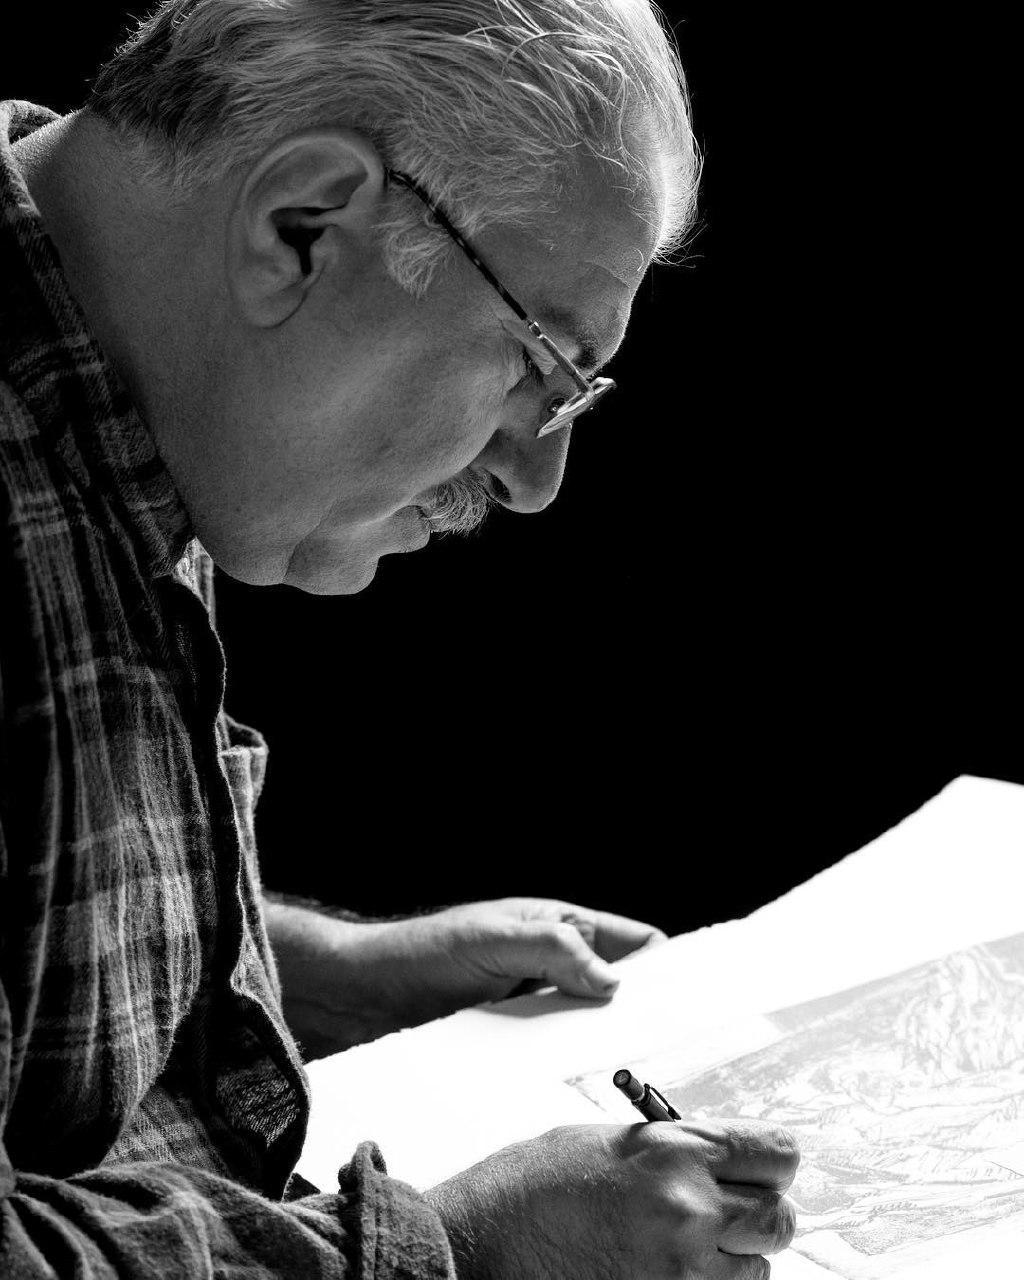 بیوگرافی و آثار استاد احمد وکیلی لینک : https://asarart.ir/Atelier/?p=729 👇 سایت : AsarArt.ir/Atelier اینستاگرام : instagram.com/AsarArtAtelier تلگرام : @AsarArtAtelier 👆